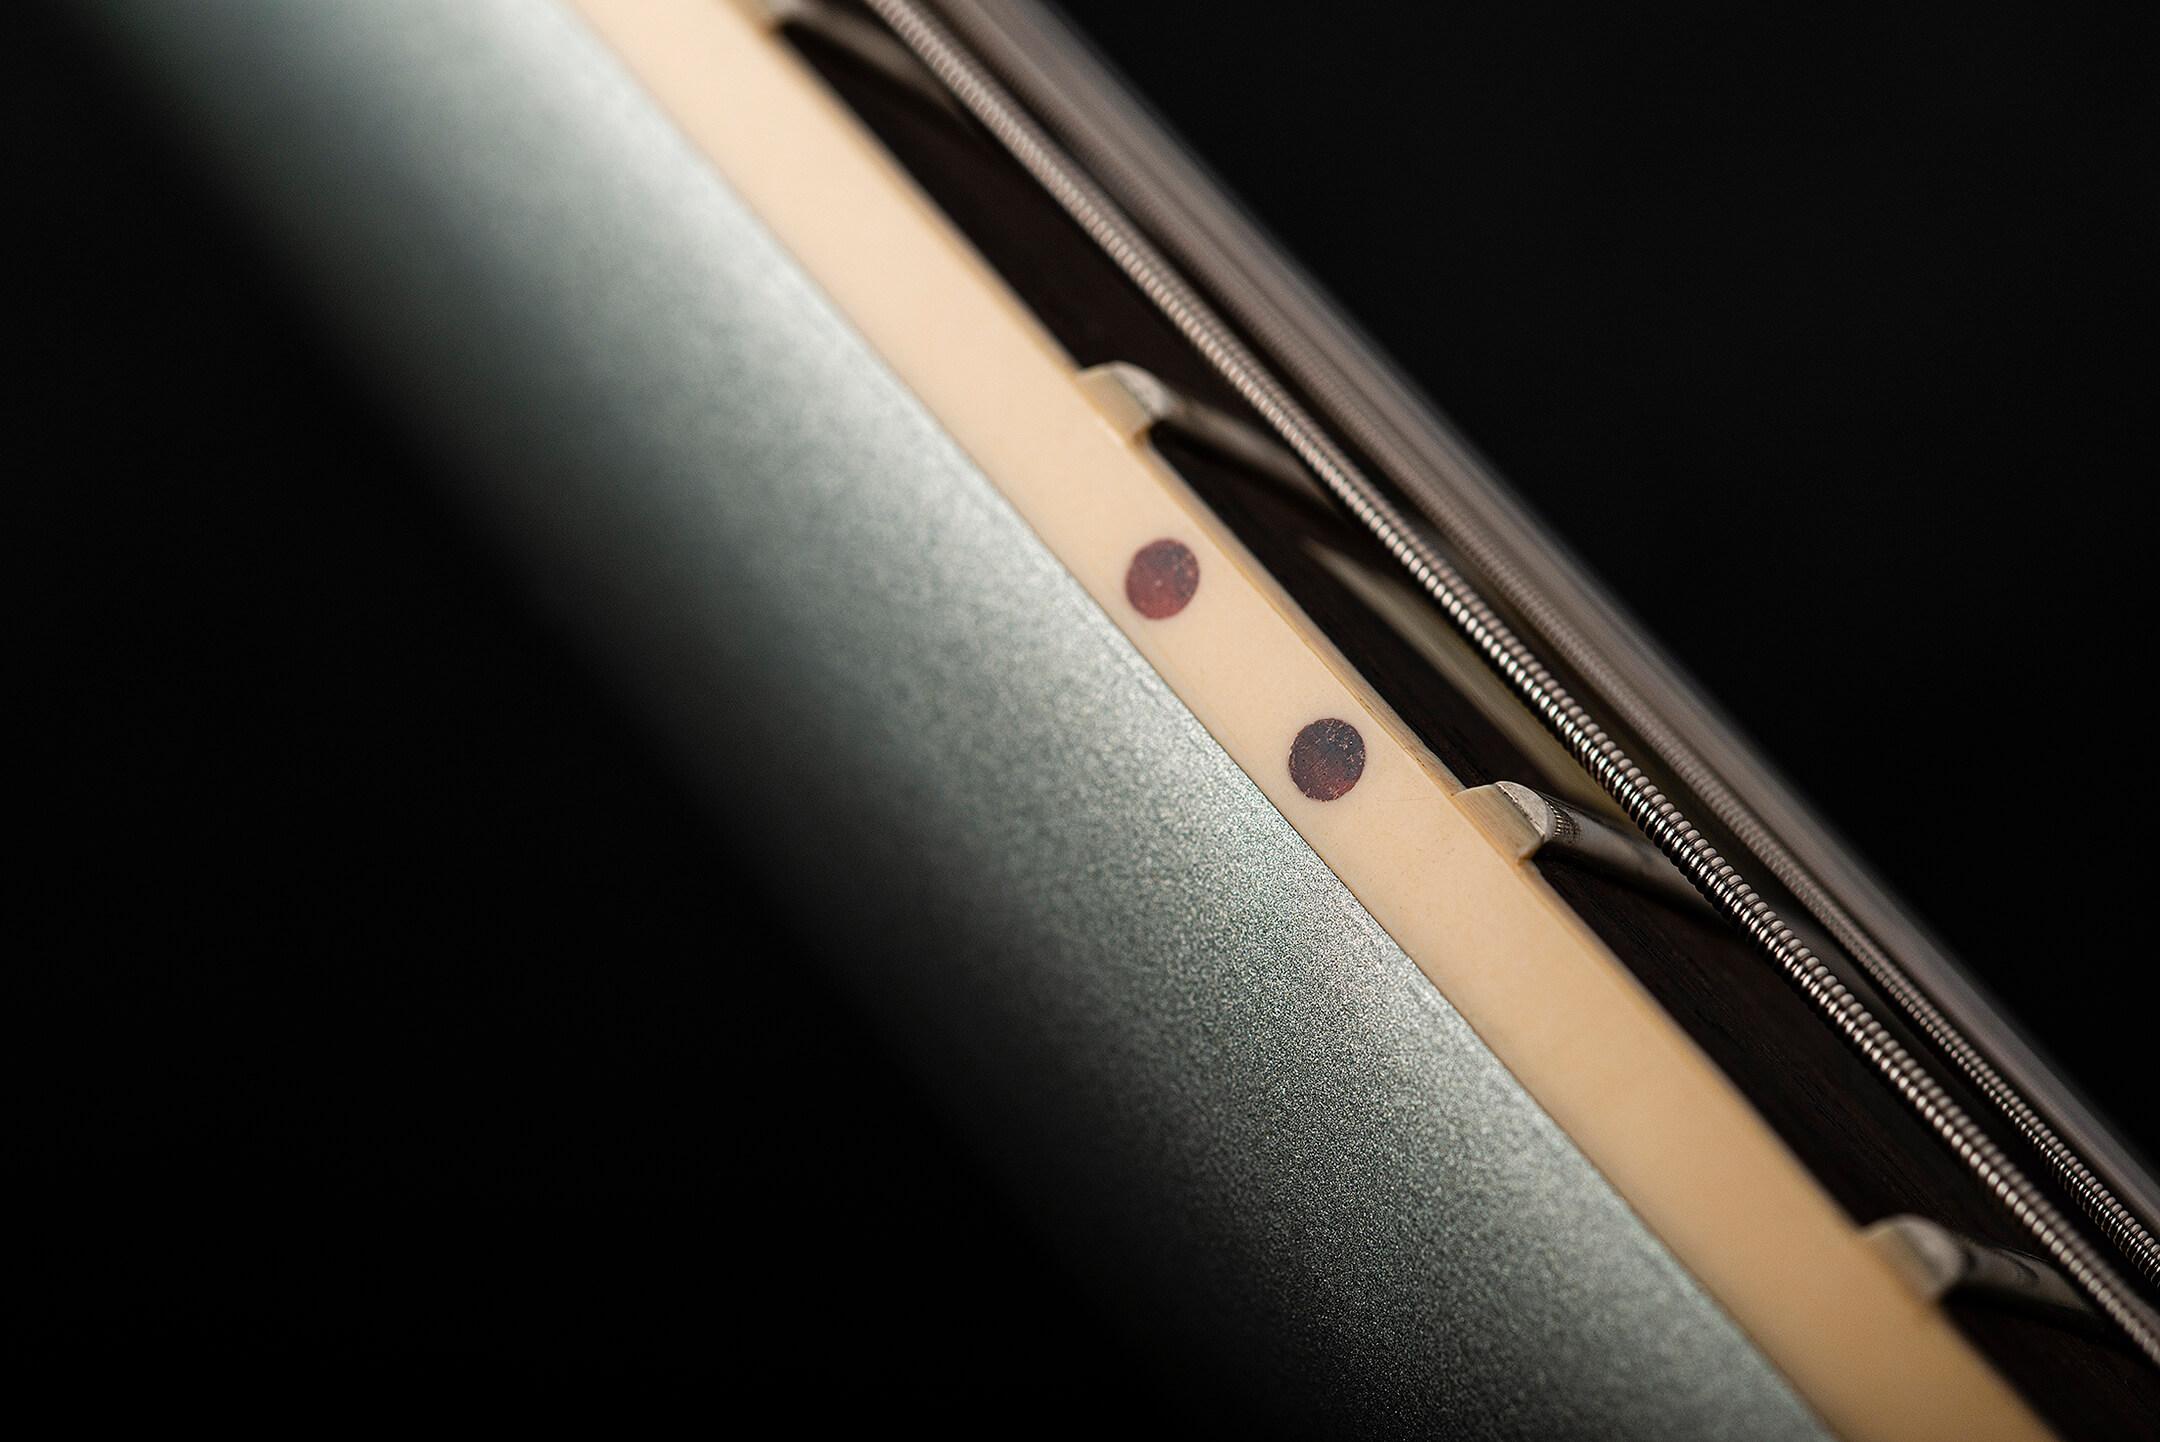 Gibson Custom '63 Firebird V Fretboard